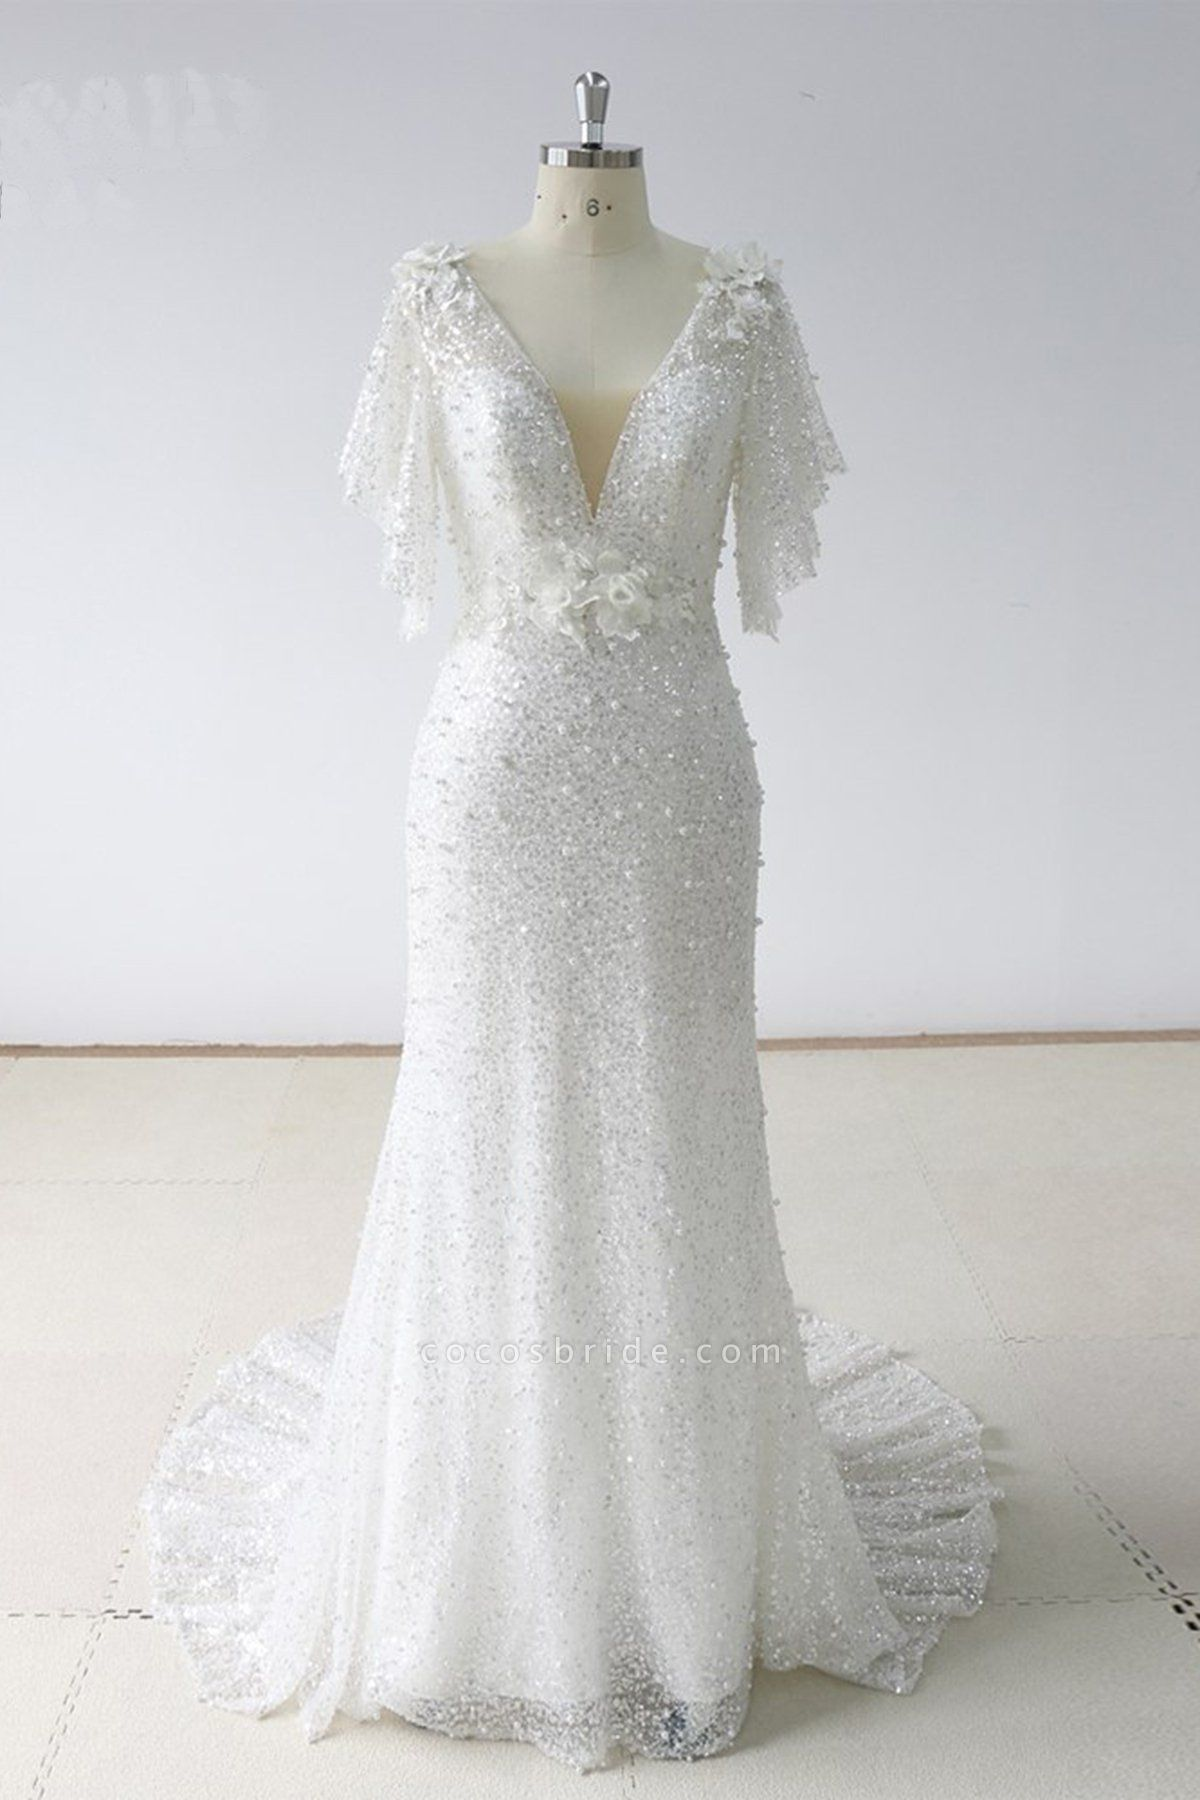 Stunning Sequins White Tulle Sweep Train Mermaid Short Sleeve Wedding Dress